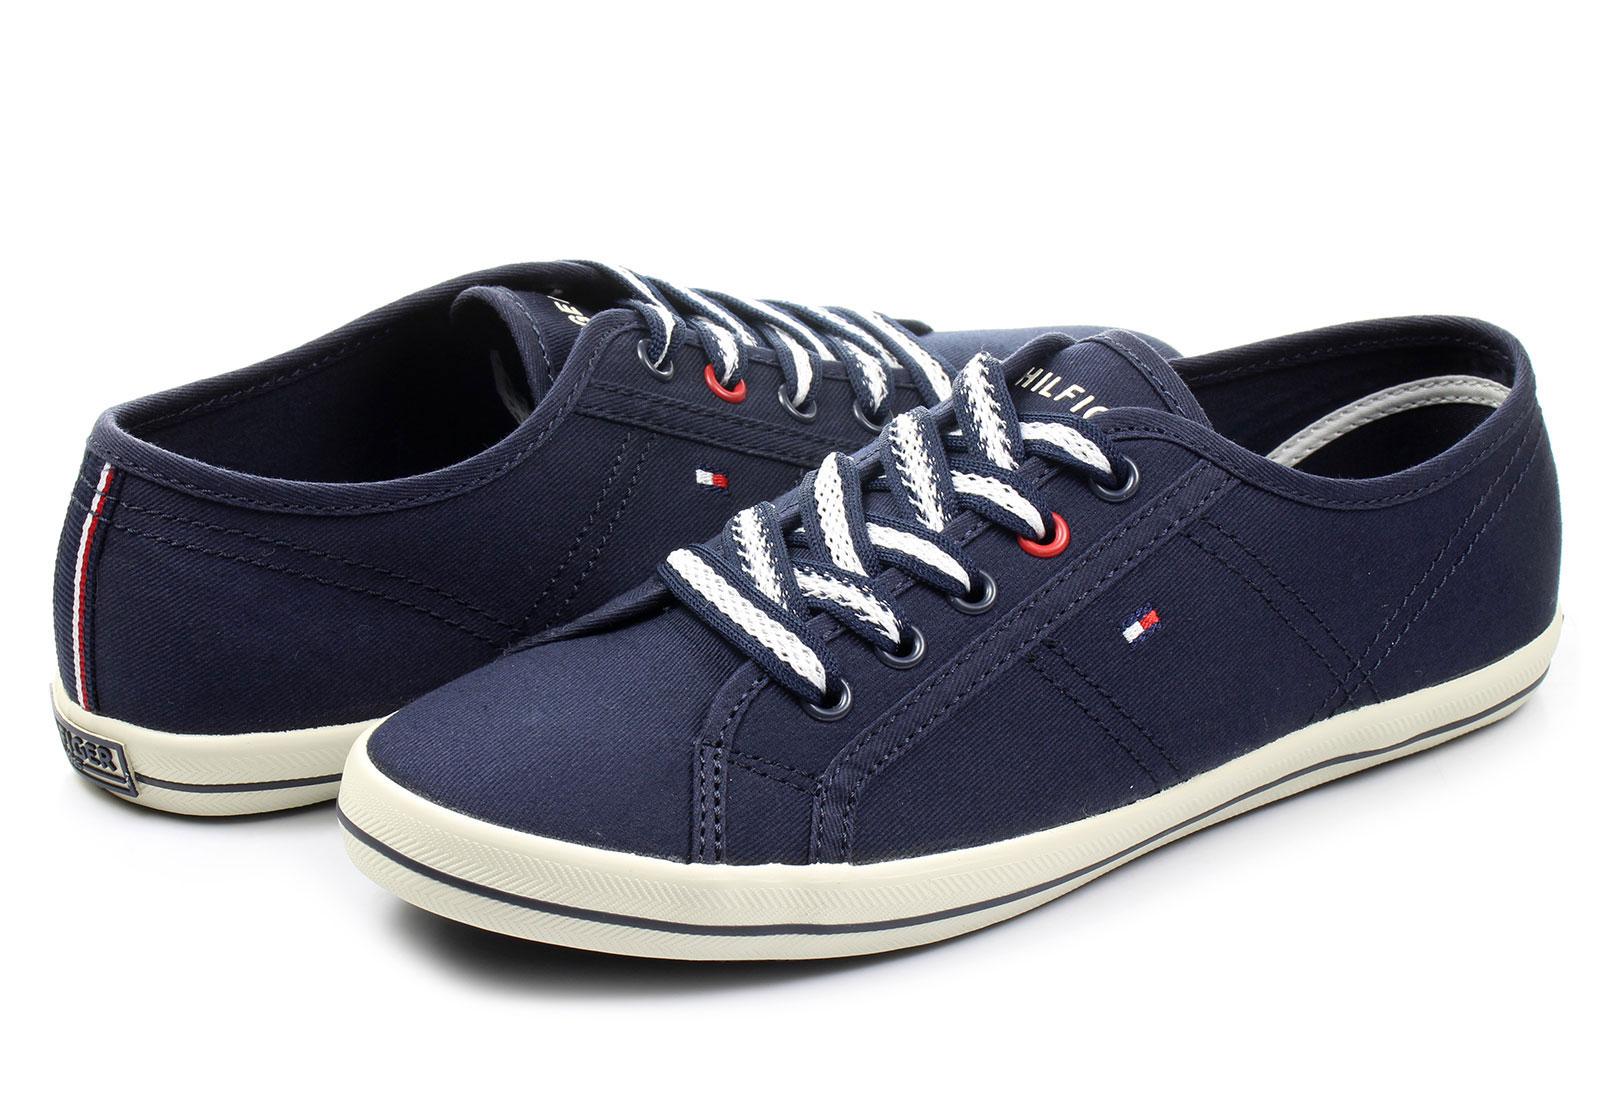 tommy hilfiger shoes victoria 2d tommy hilfiger blue cotton shoes. Black Bedroom Furniture Sets. Home Design Ideas